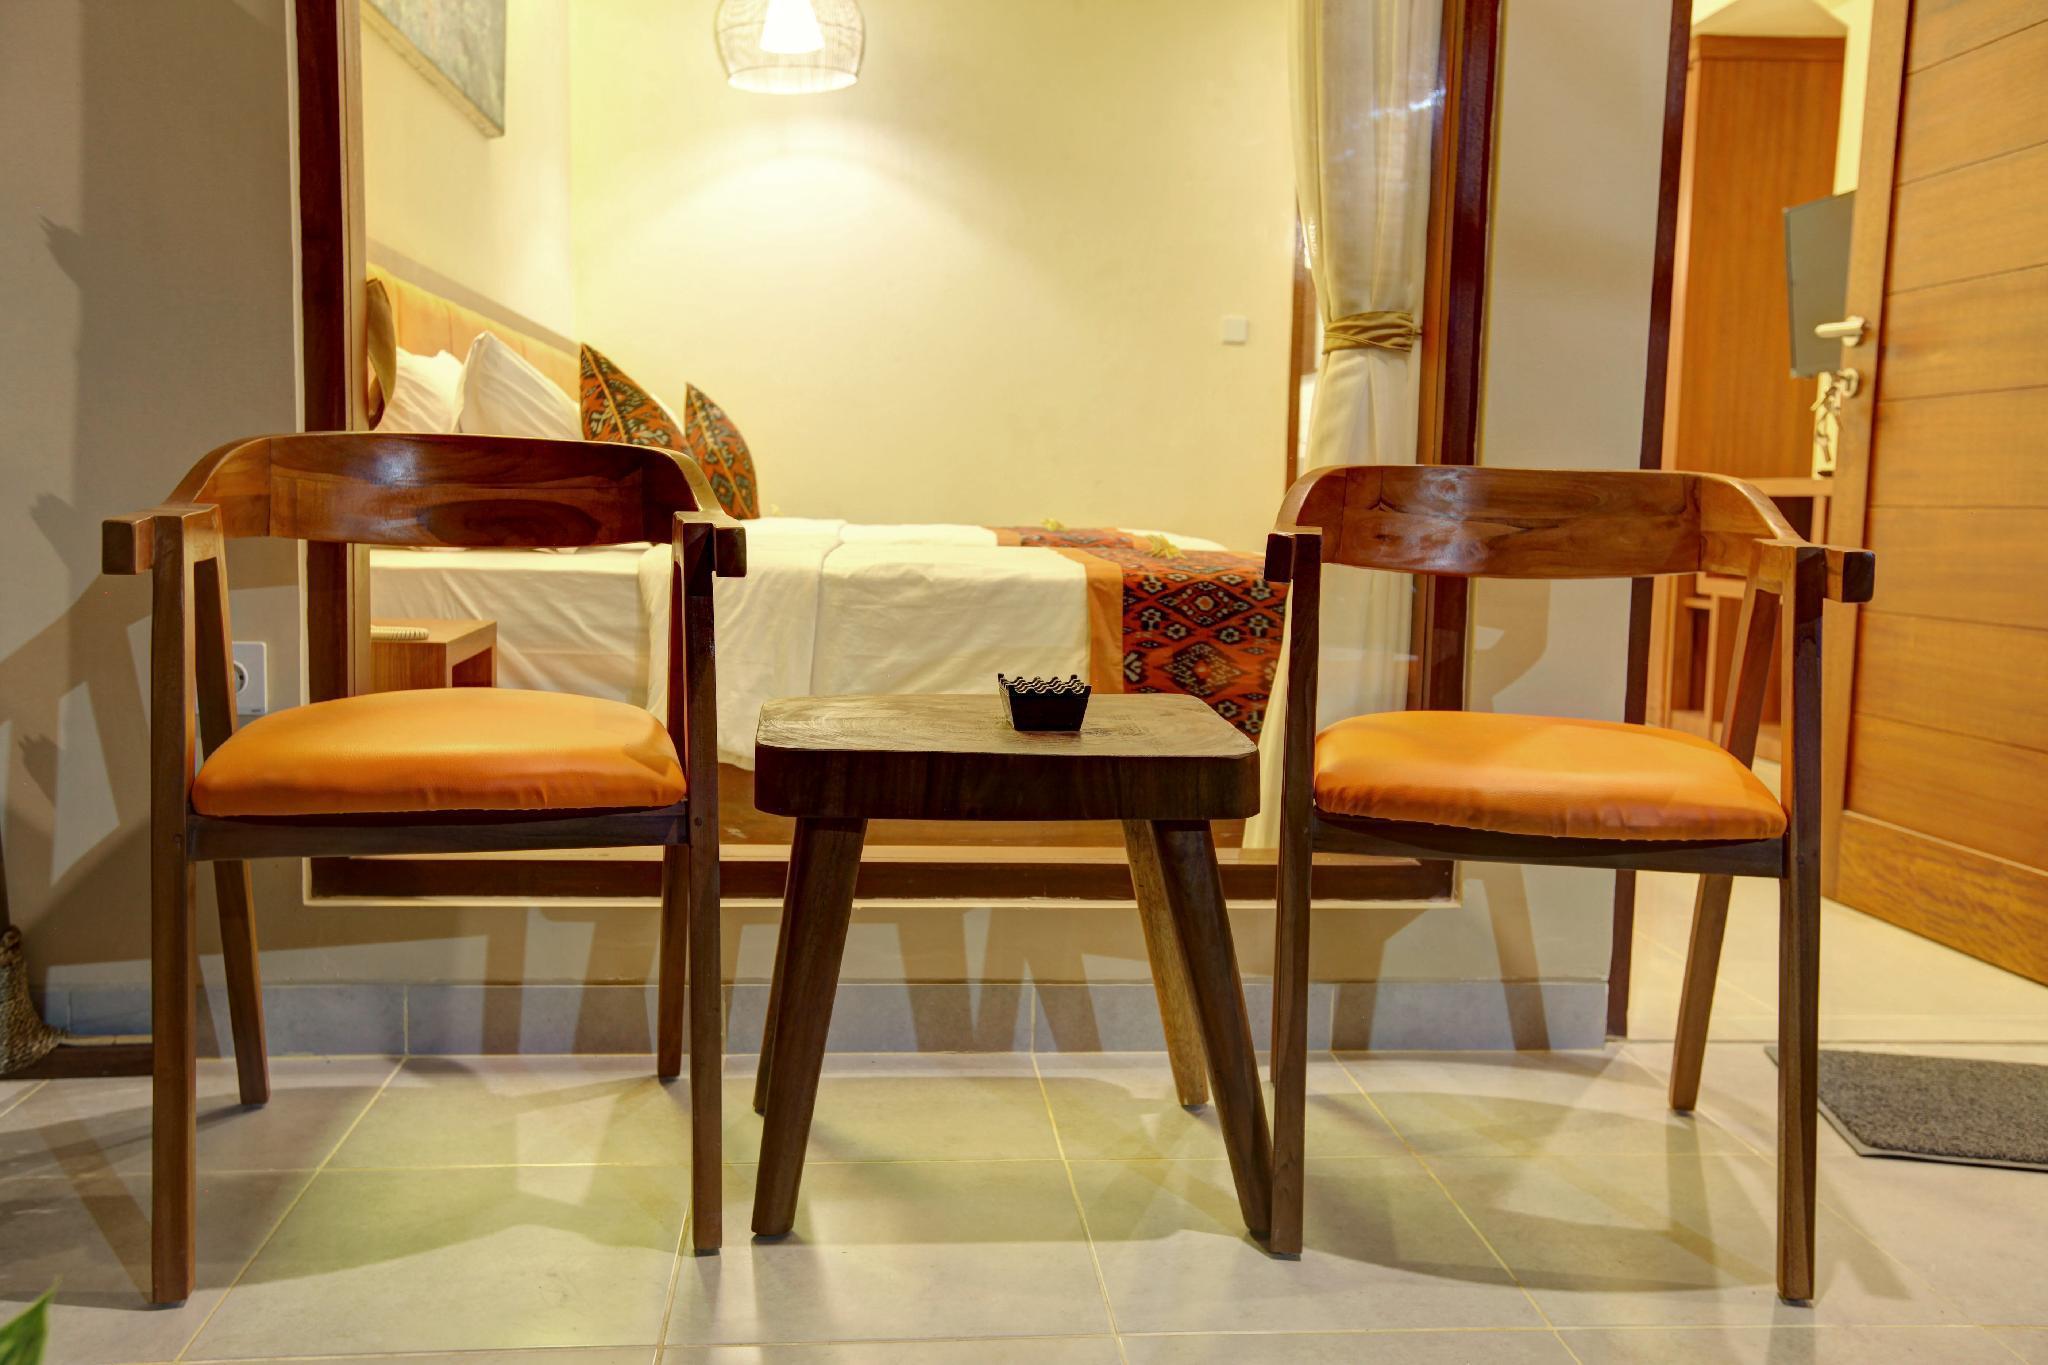 Gana Ubud Hotel and Restaurant